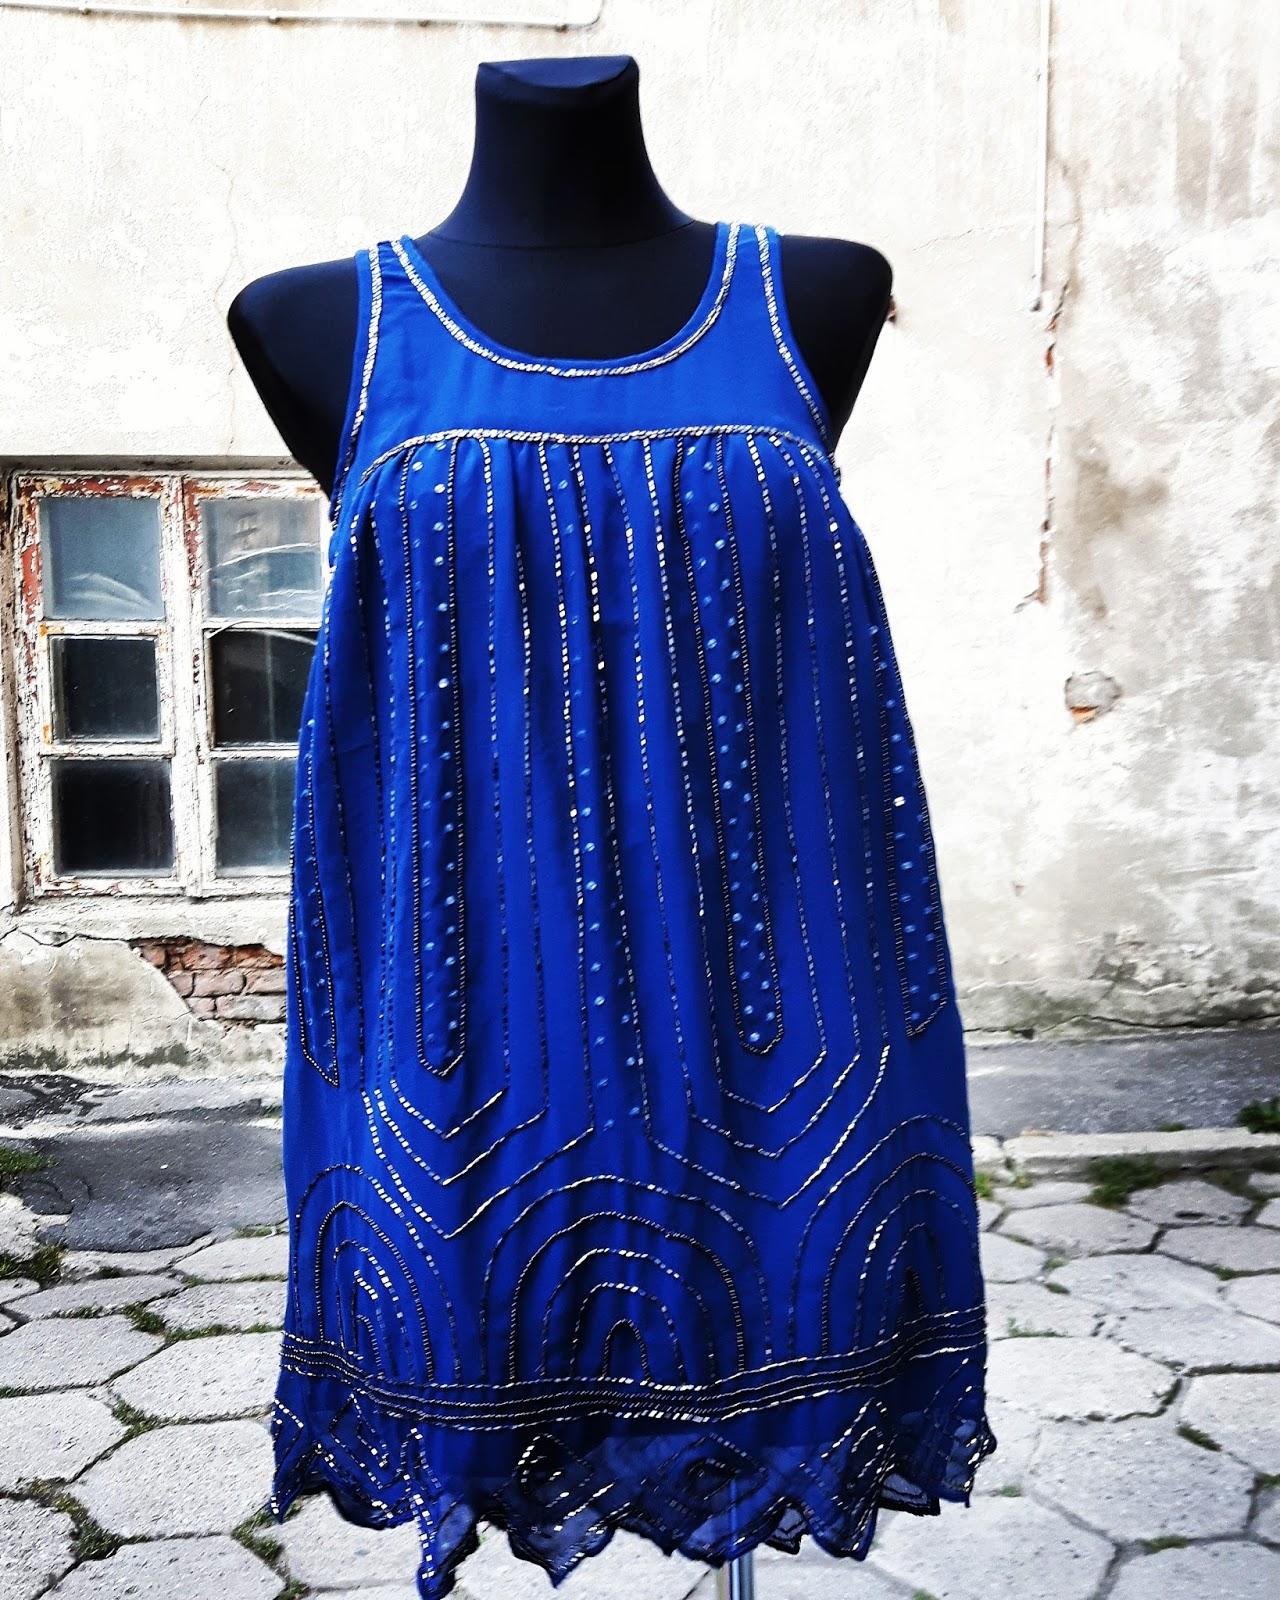 Vintage Boutique Sukienka Vintage Wieczorowa Koktajlowe Na Wesele